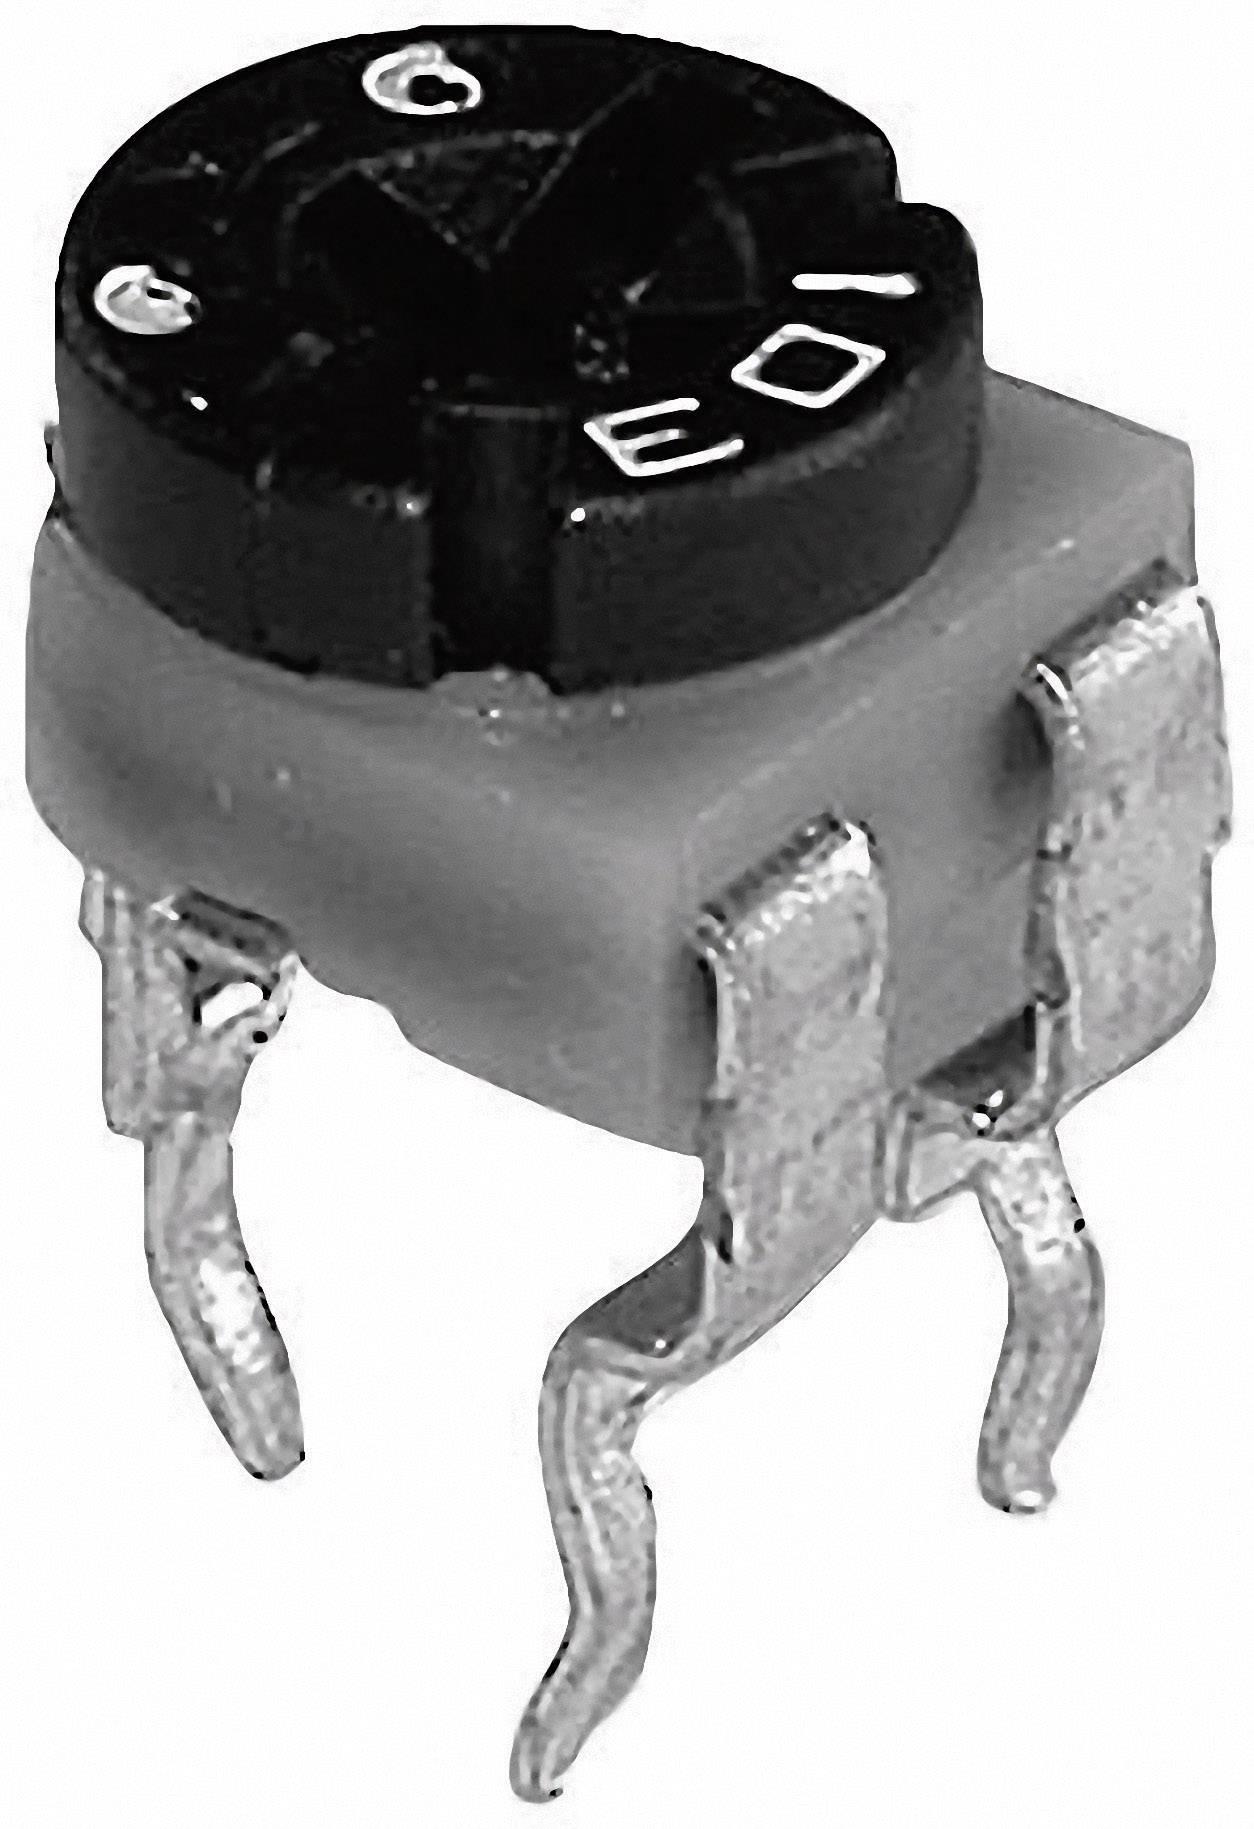 Uhlíkový trimer TT Electronics AB 601010, lineárny, 100 Ohm, 0.1 W, 1 ks